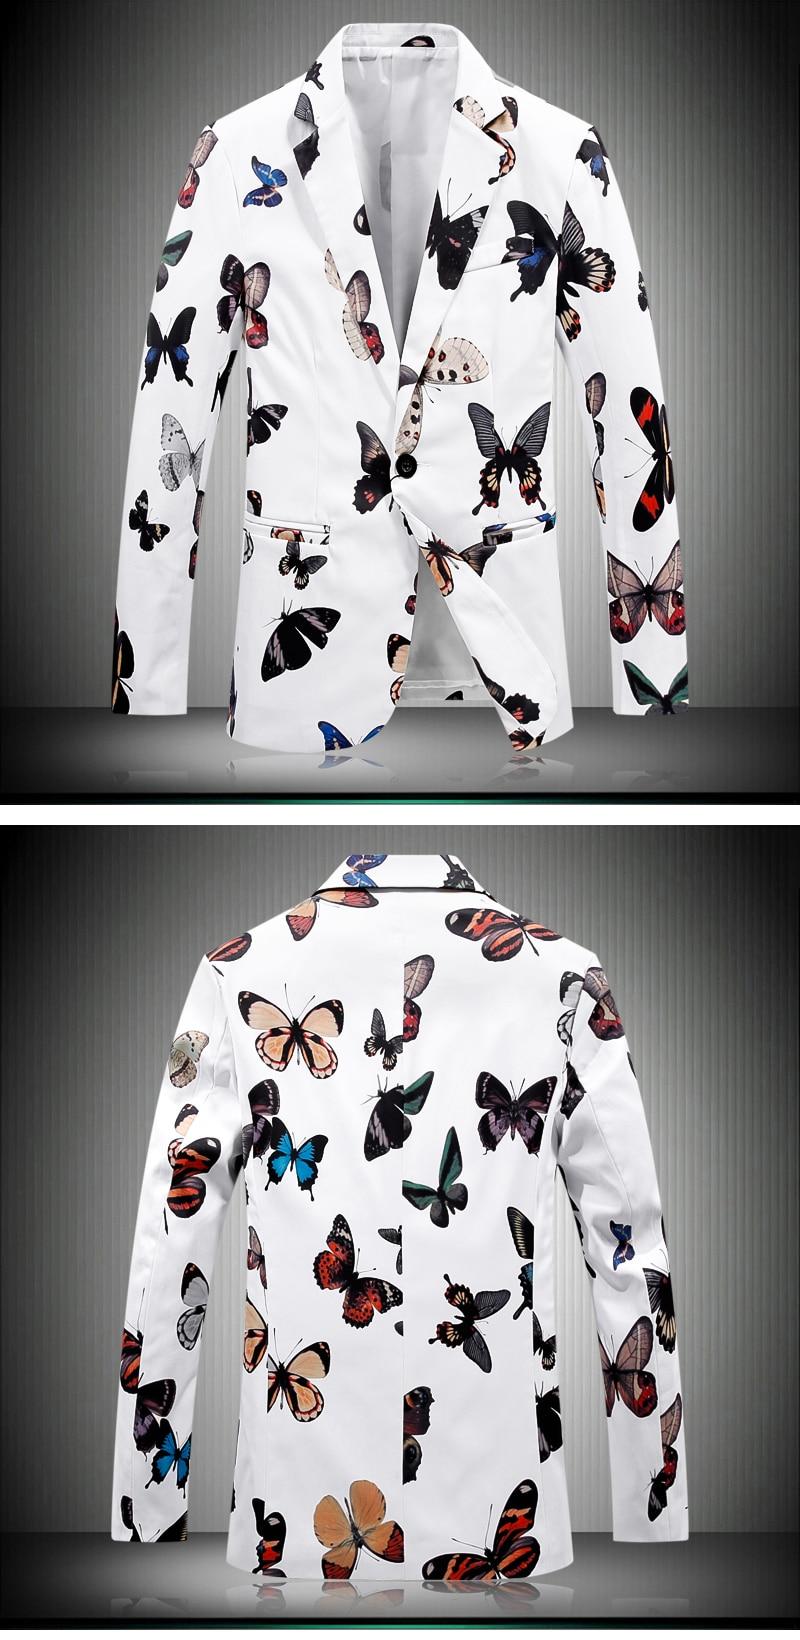 HTB1RY8FQFXXXXbcXpXXq6xXFXXX7 - Men's Floral Blazer Butterfly Printing Suit Jacket Dress Blazer Slim Wedding Veste Homme Mariage Brand-clothing Free Shipping